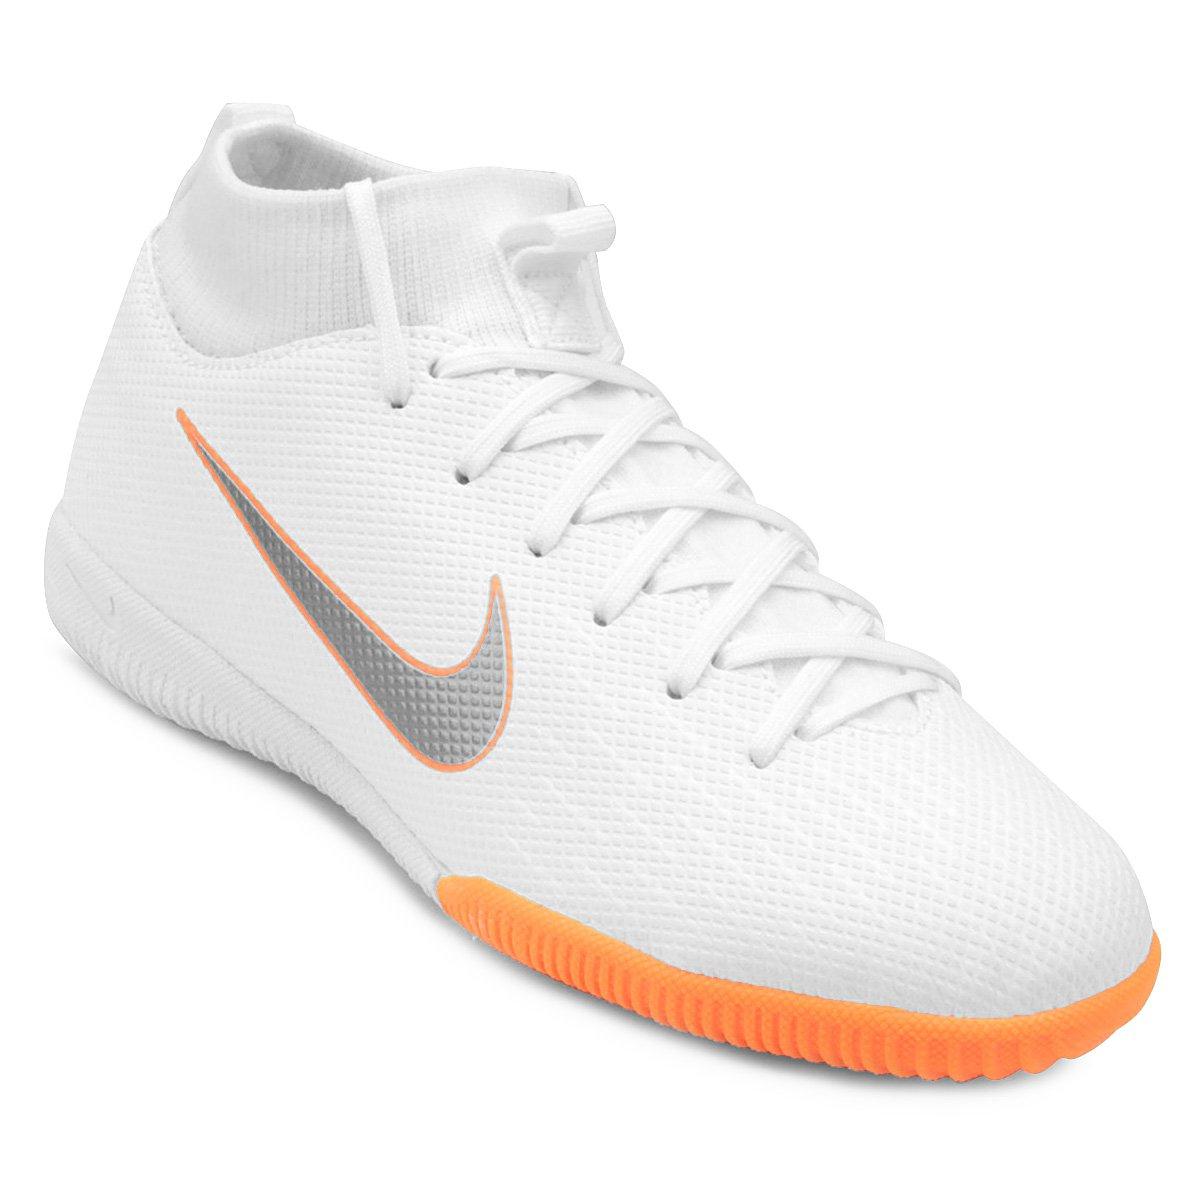 5311ae24e0 Chuteira Futsal Infantil Nike Mercurial Superfly 6 Academy